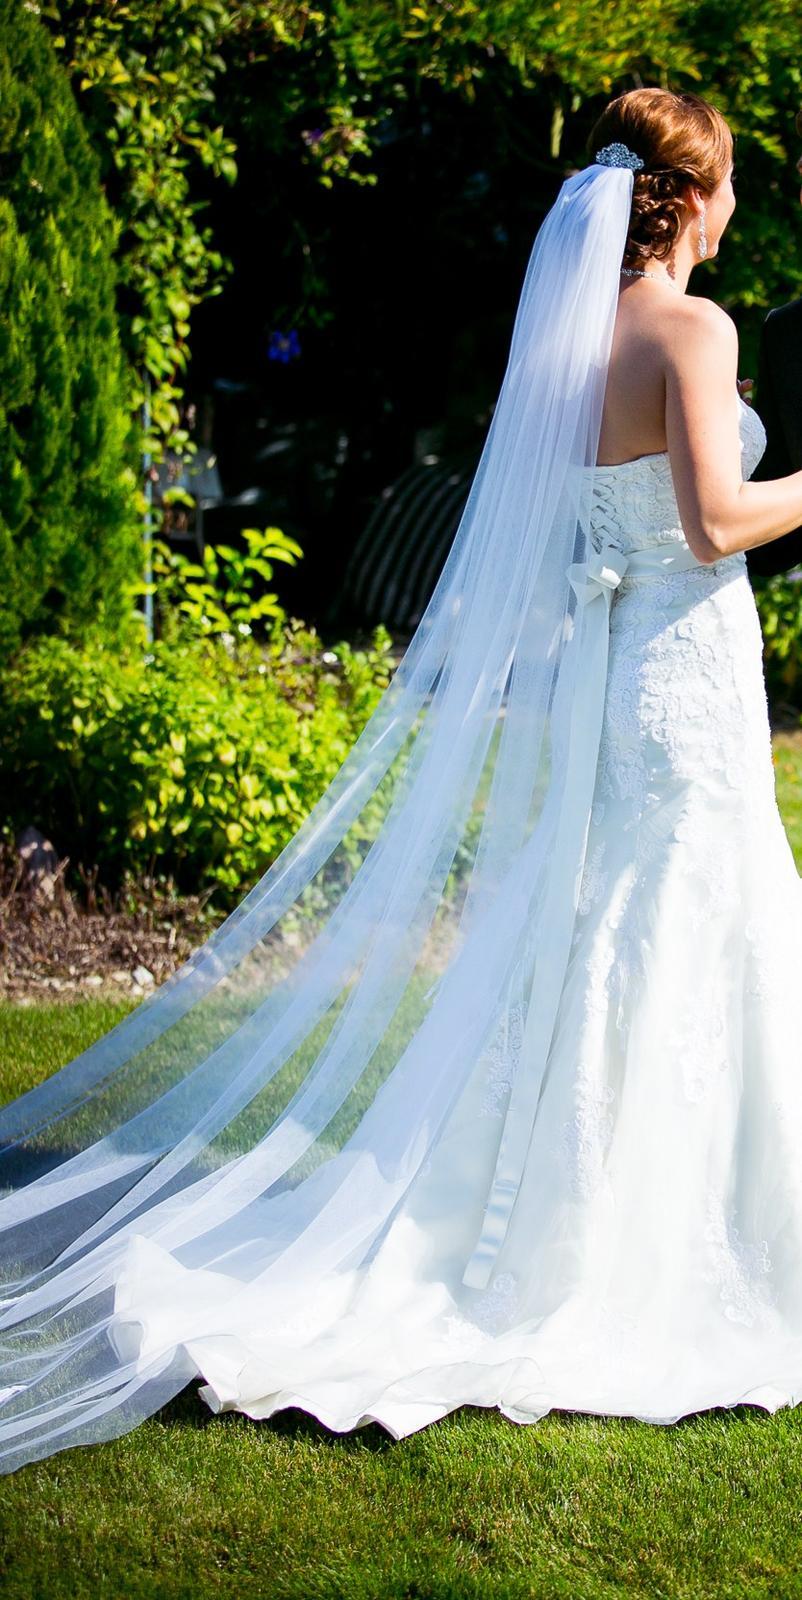 diane legrand 13EM2 svadobne šaty - Obrázok č. 2